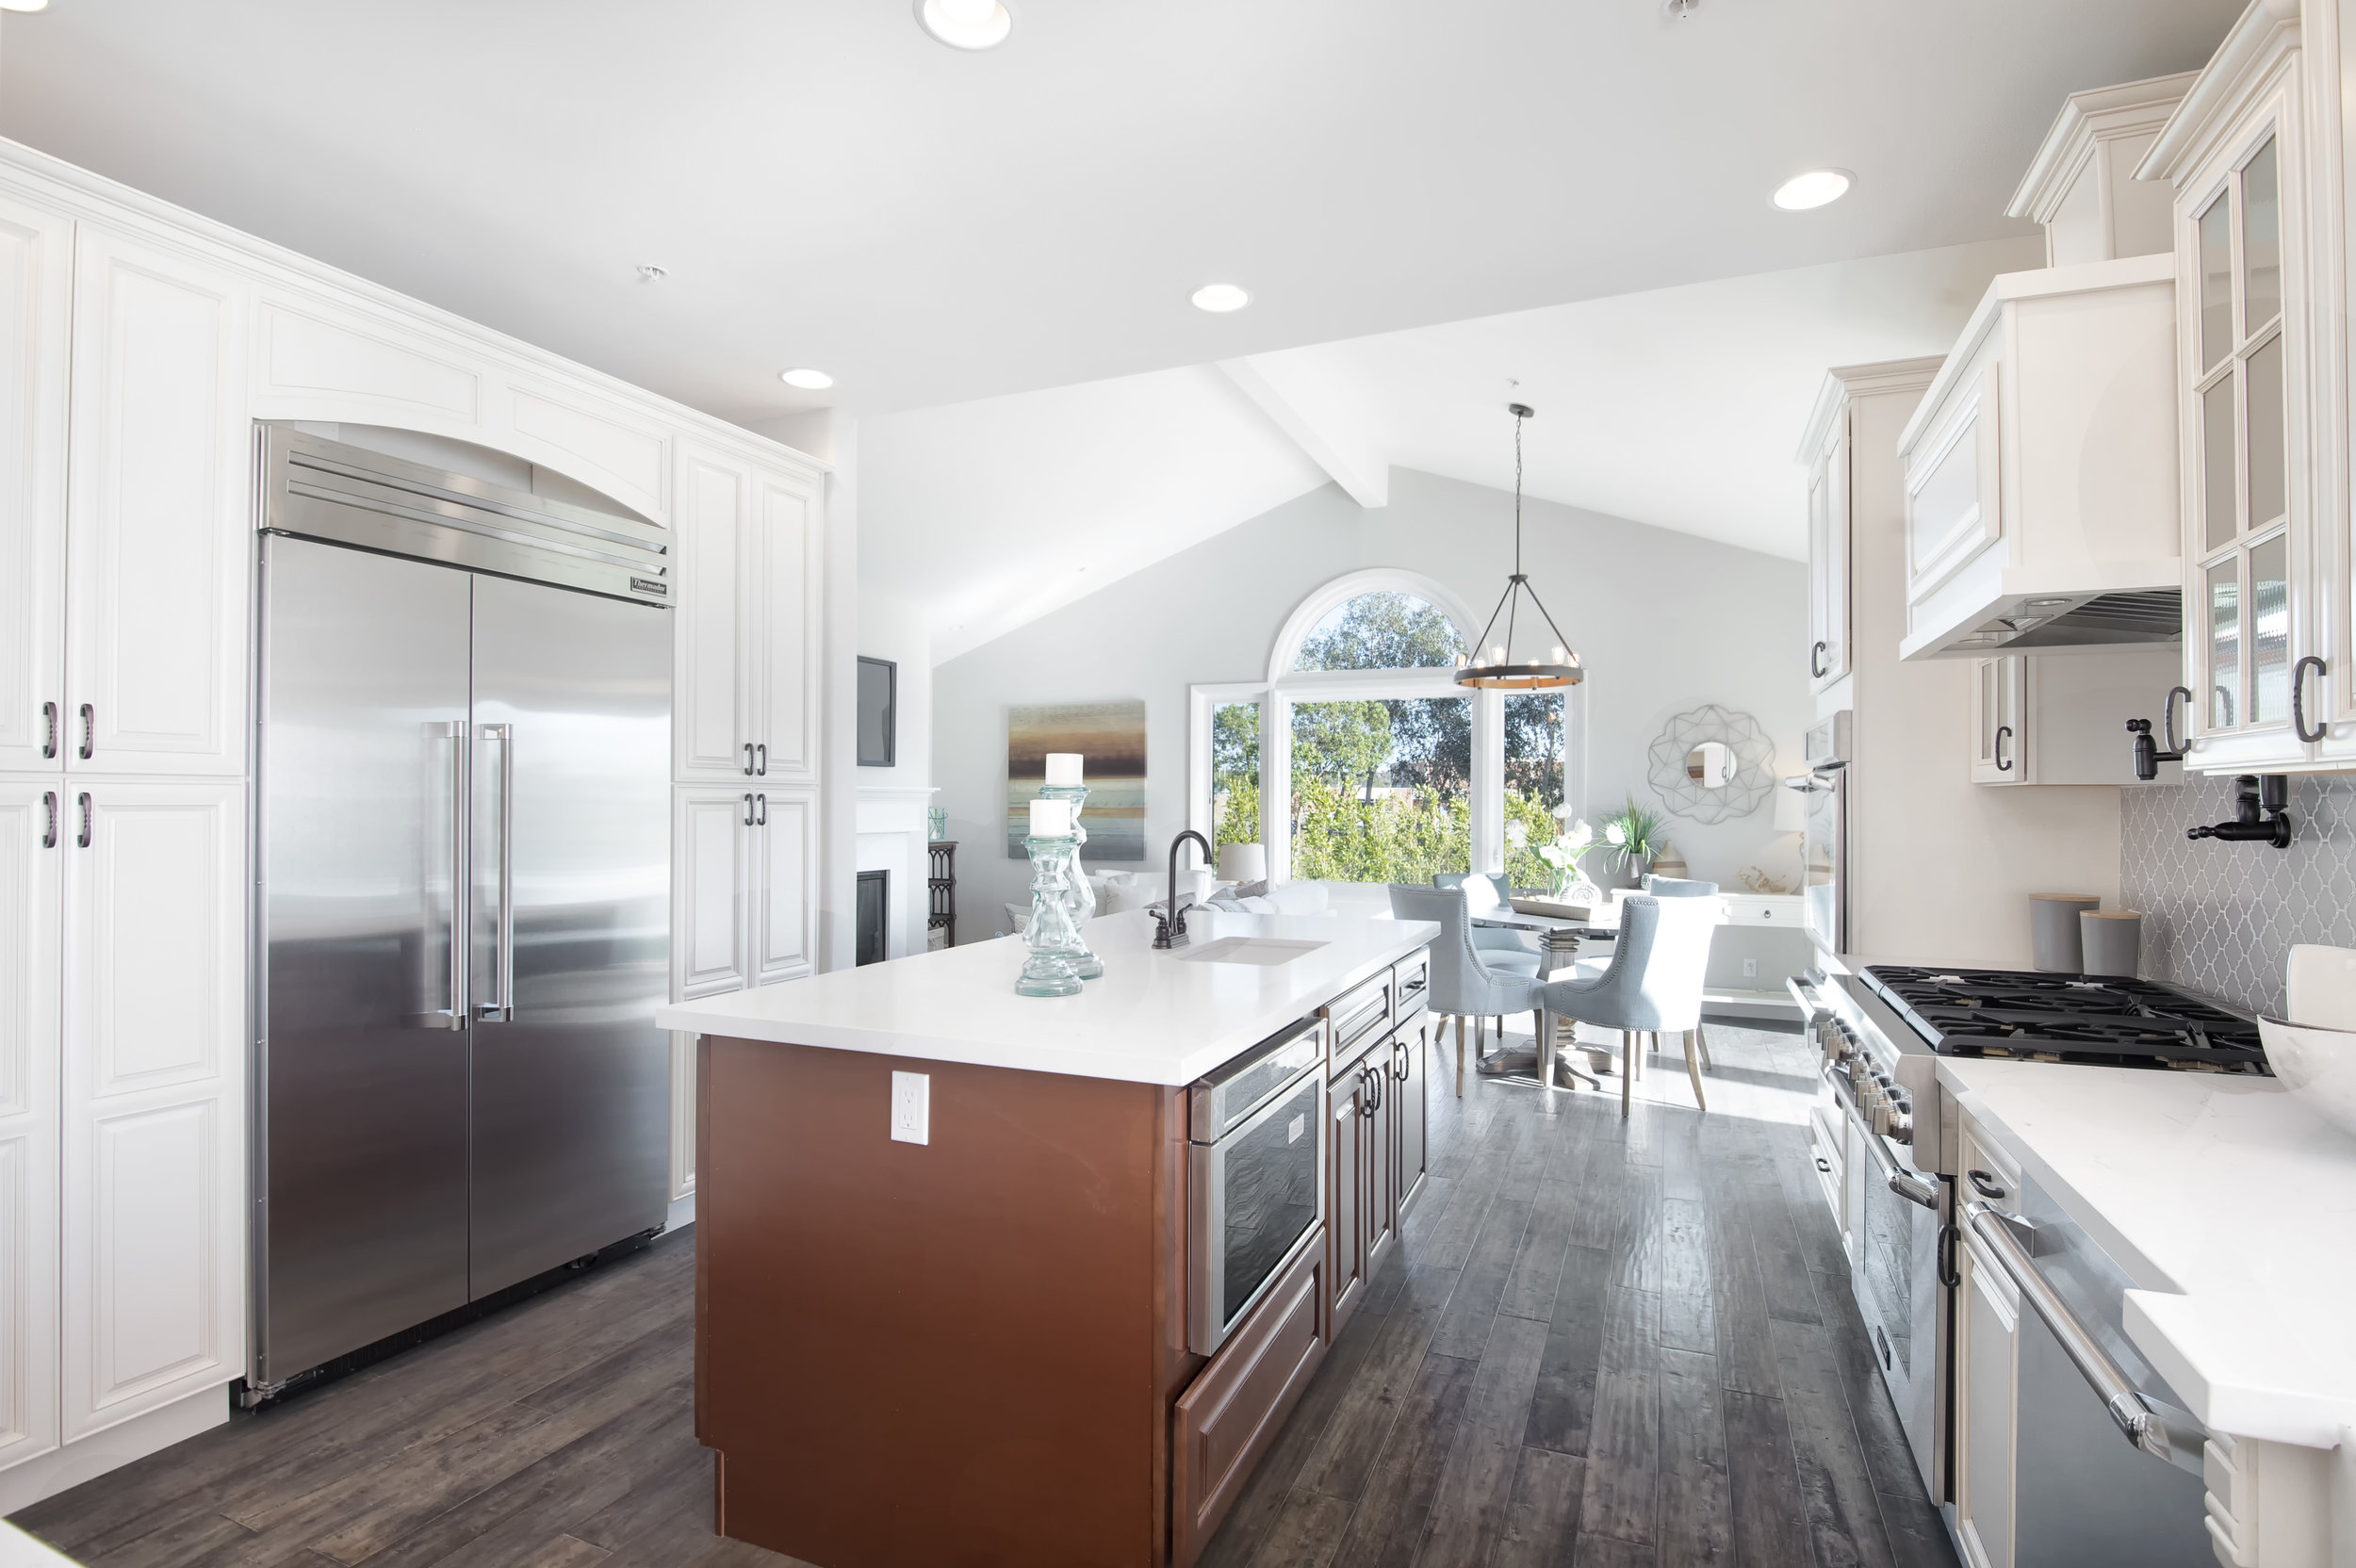 006 6130 Via Cabrillo For Sale Lease The Malibu Life Team Luxury Real Estate.jpg